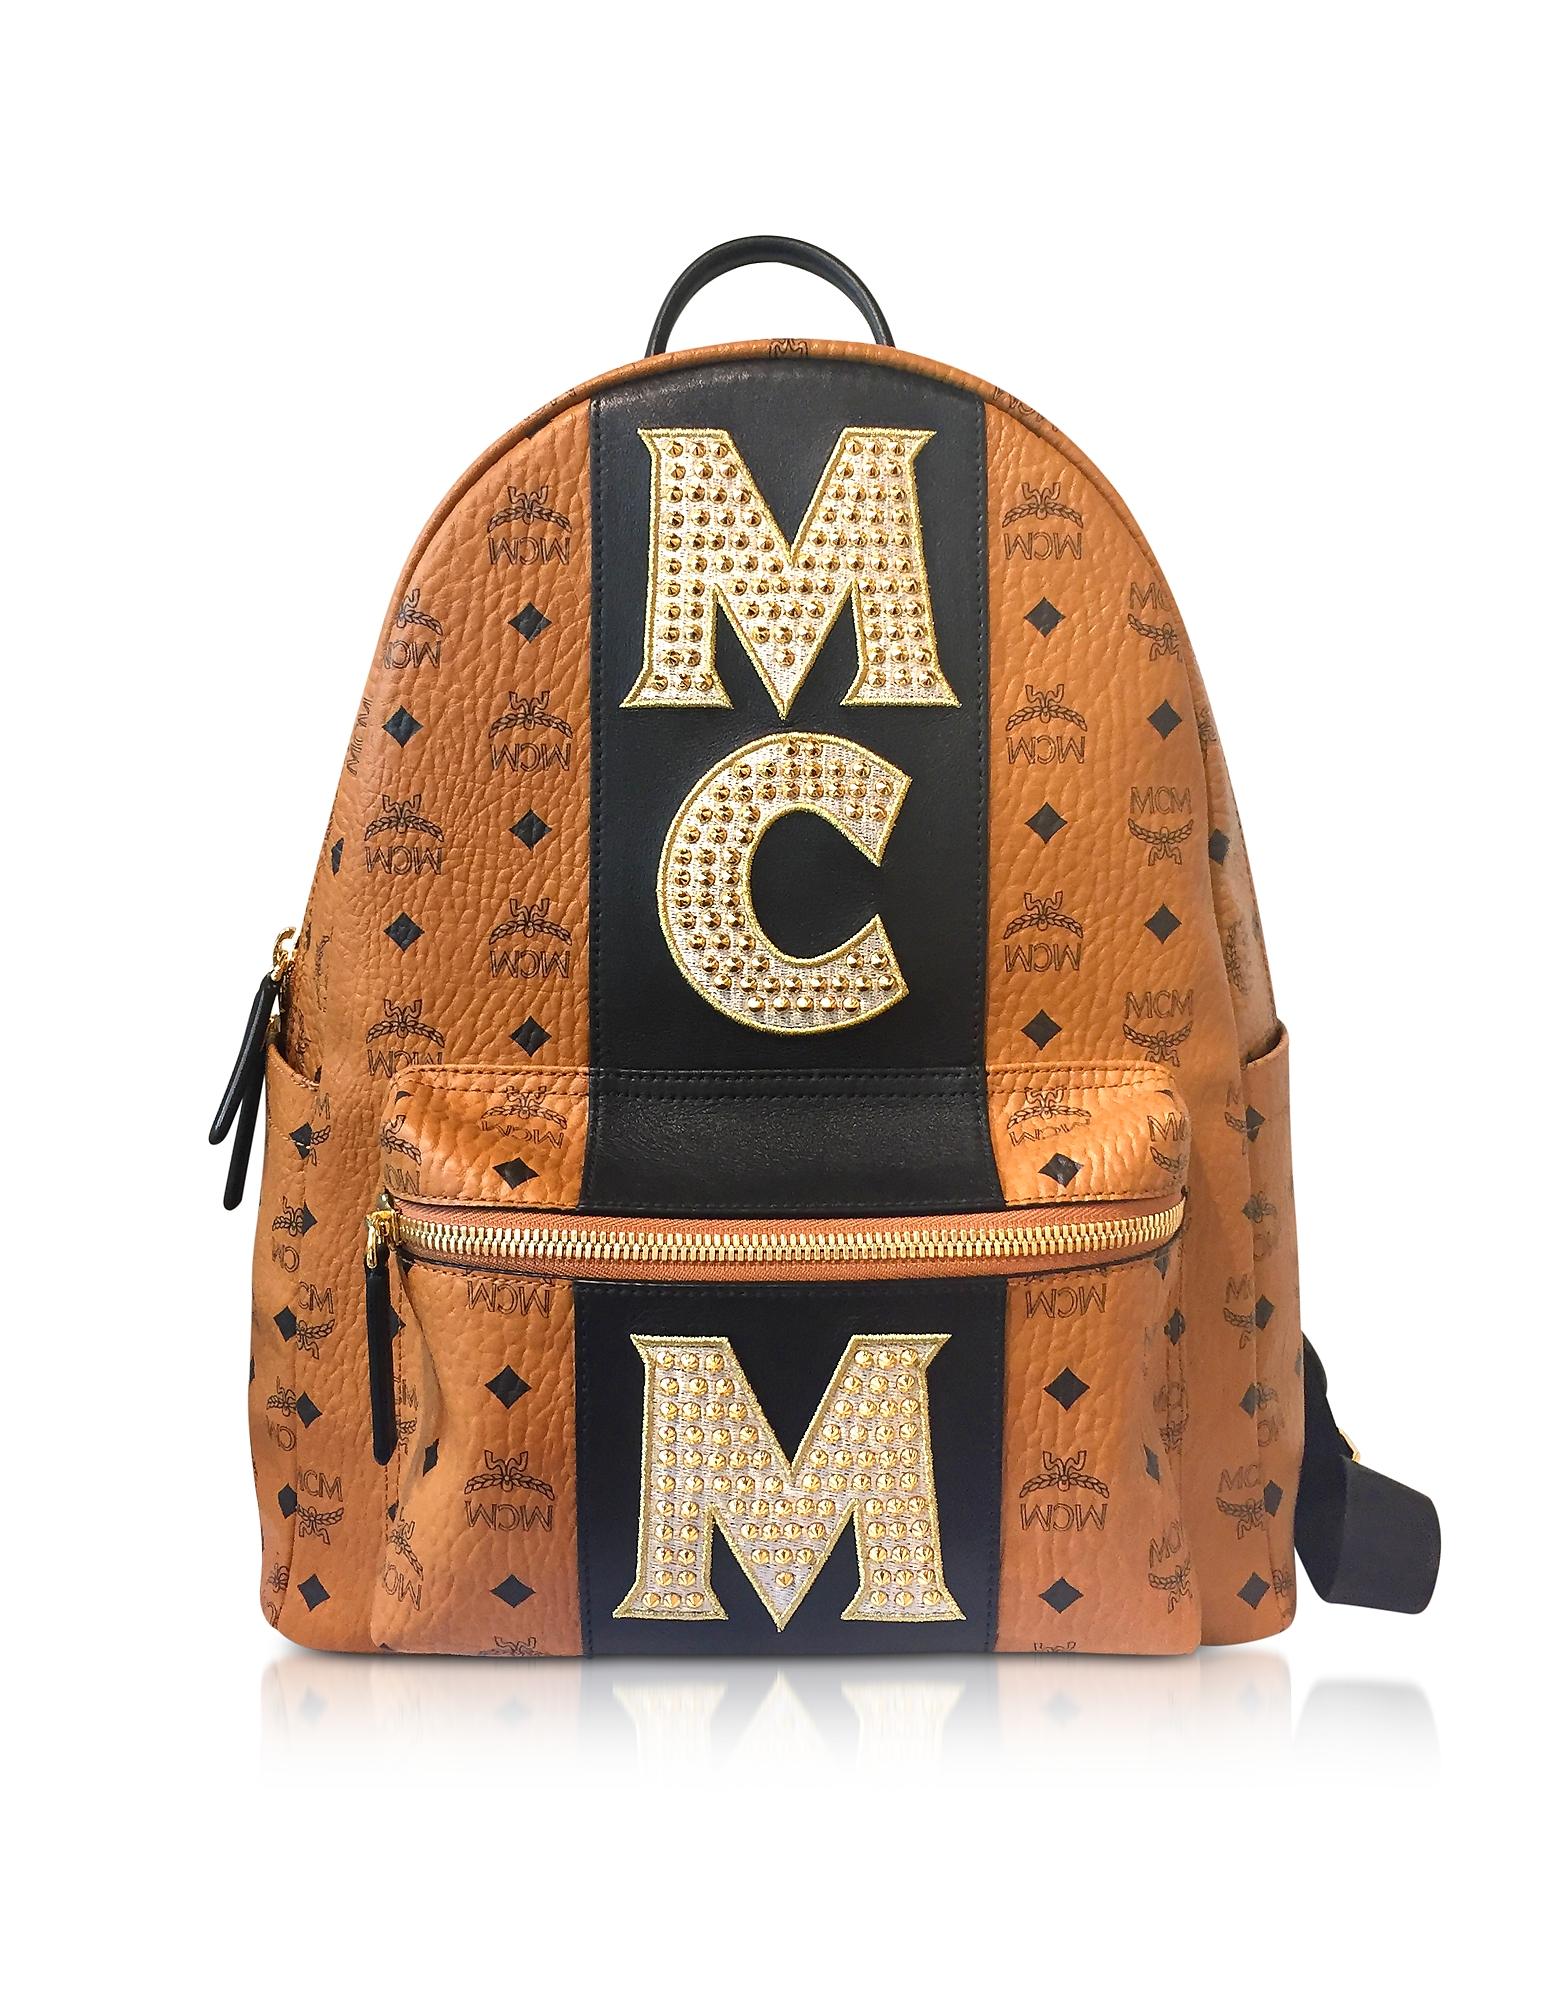 79973f18c270d Mcm Stark Visetos Backpack - Buy Best Mcm Stark Visetos Backpack from  Fashion Influencers | Brick & Portal